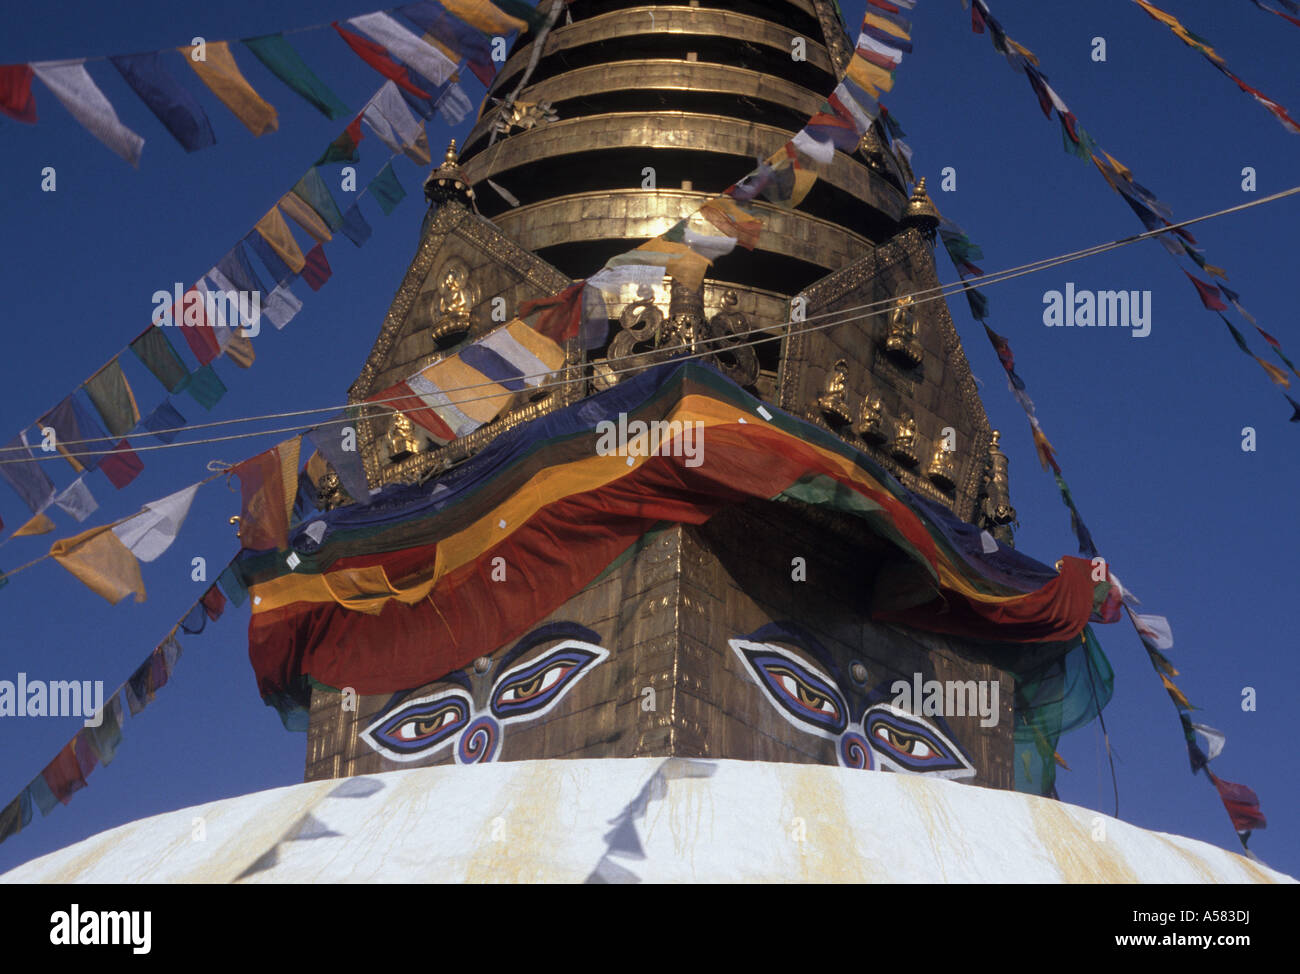 Partial view of the great Stupa of Svayambunath, with prayerflags and the 'all seeing eyes ot Buddha', Svayambunath, - Stock Image